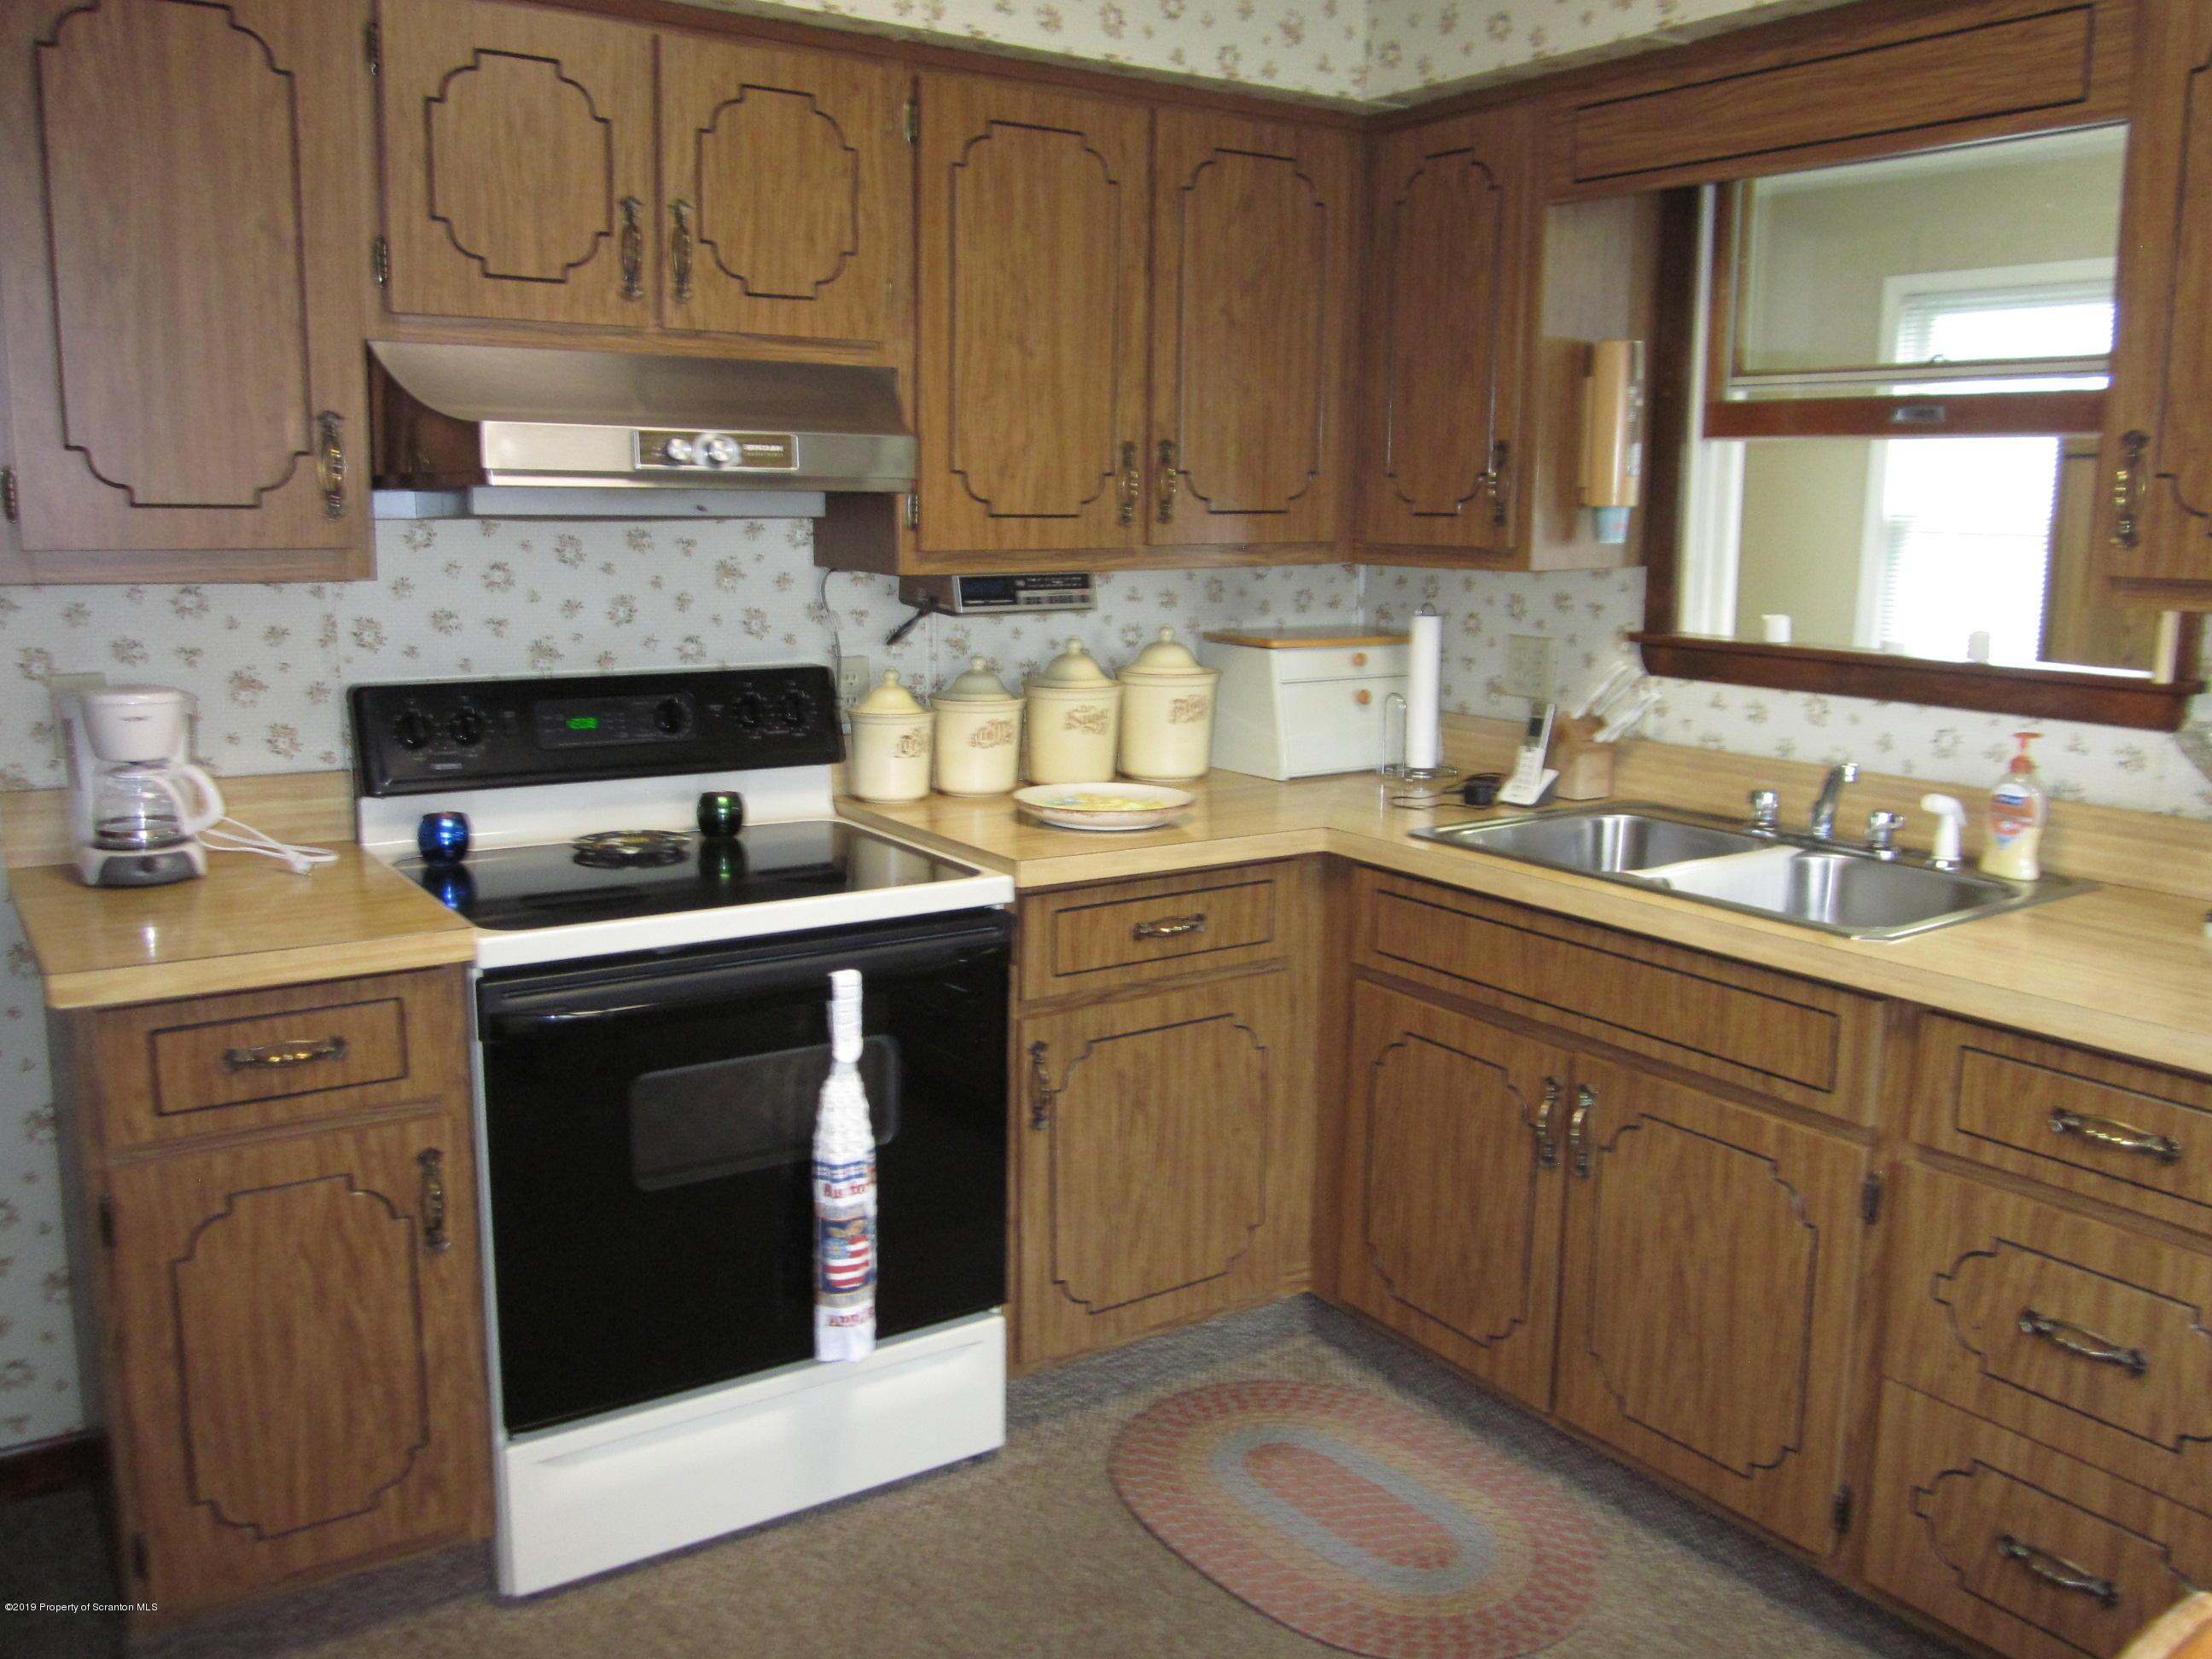 324 Caroline Ave, Scranton, Pennsylvania 18504, 3 Bedrooms Bedrooms, 7 Rooms Rooms,1 BathroomBathrooms,Single Family,For Sale,Caroline,19-2966